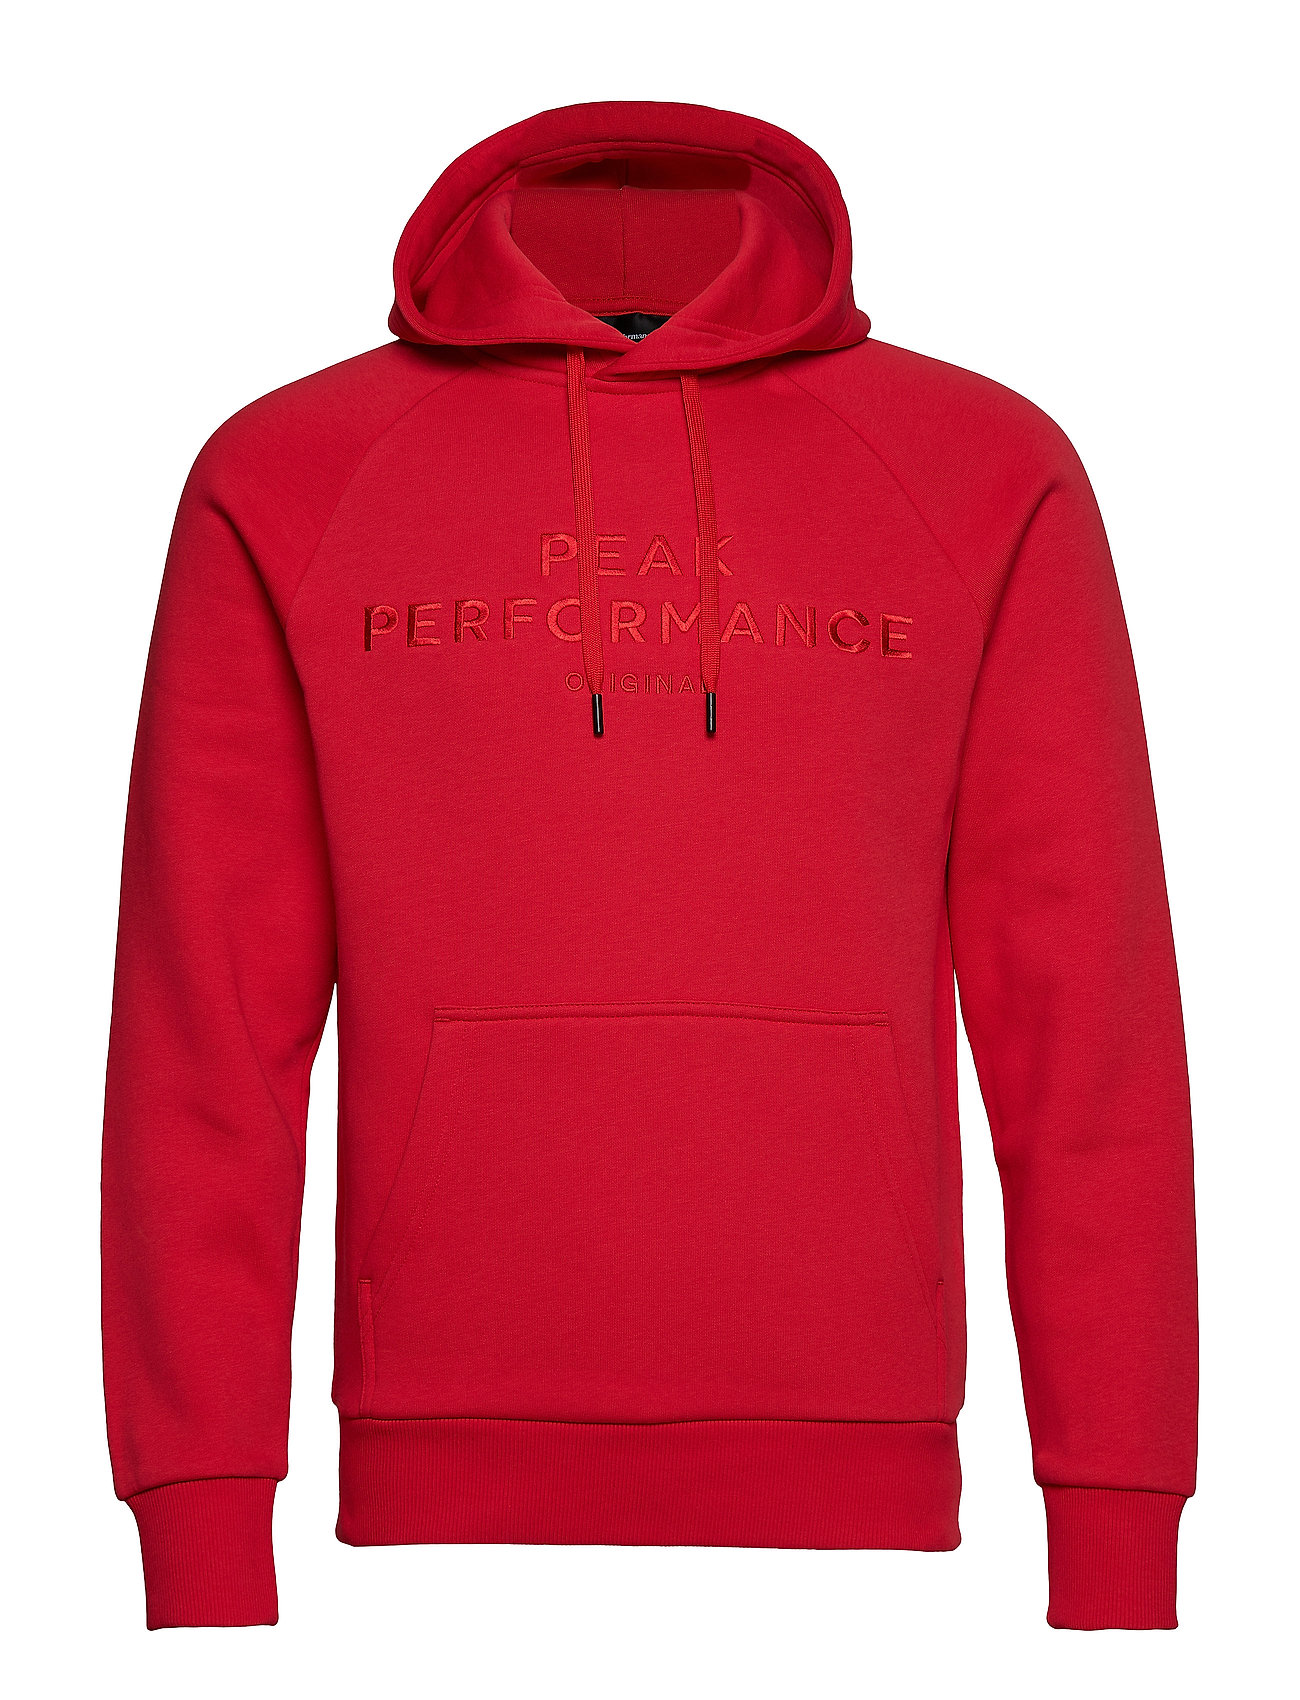 Peak Performance M ORIG H - CHINESE RED